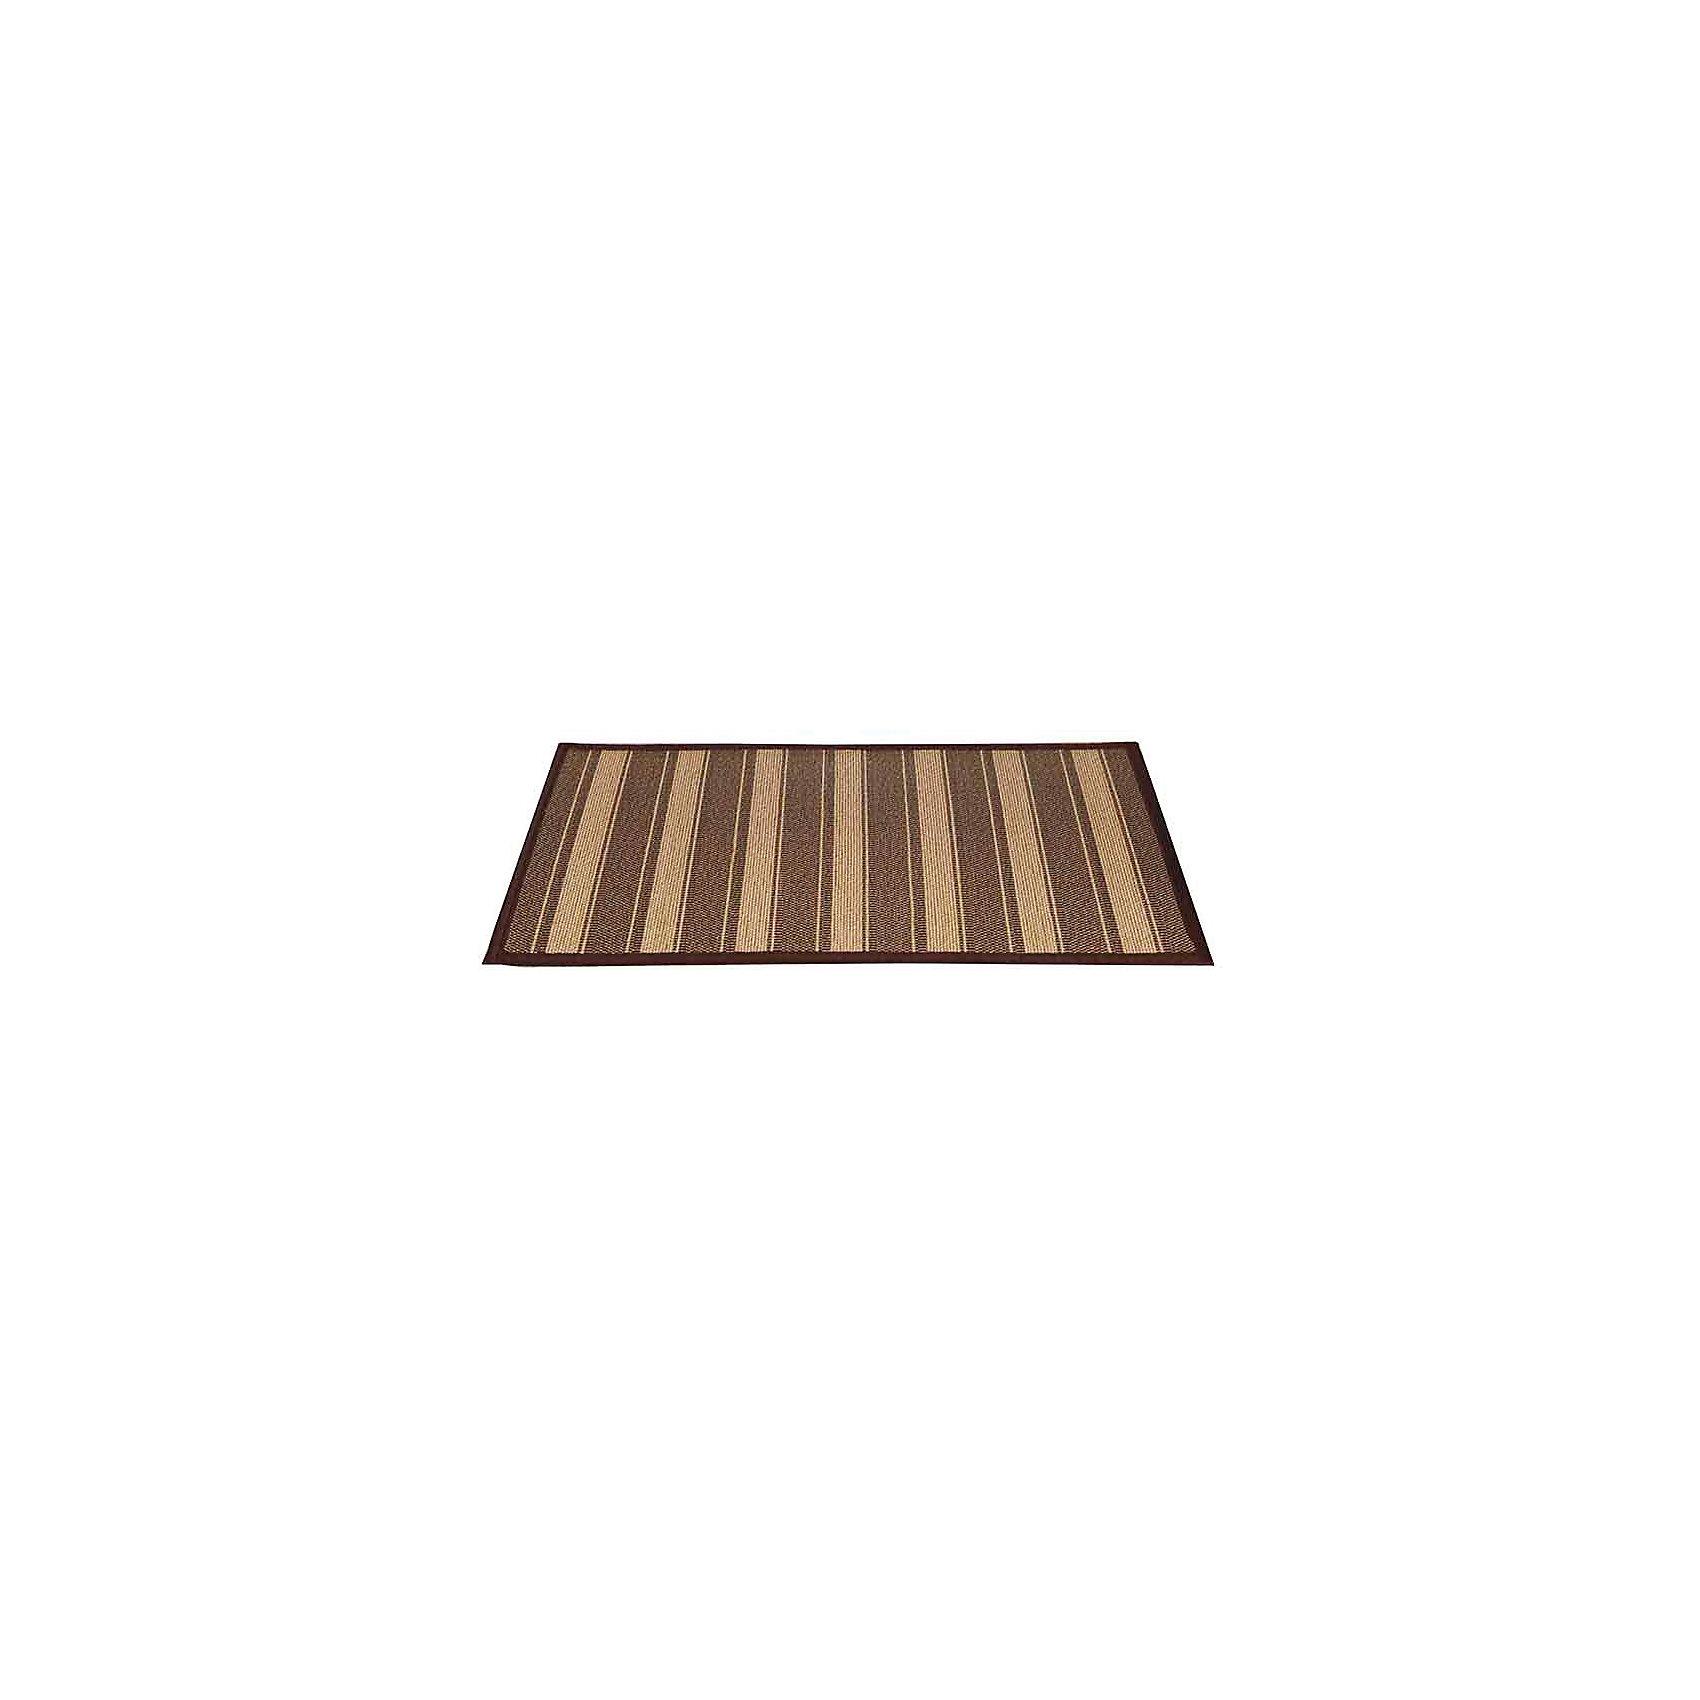 Циновка 500х800мм бамбук, Amigo, коричневый